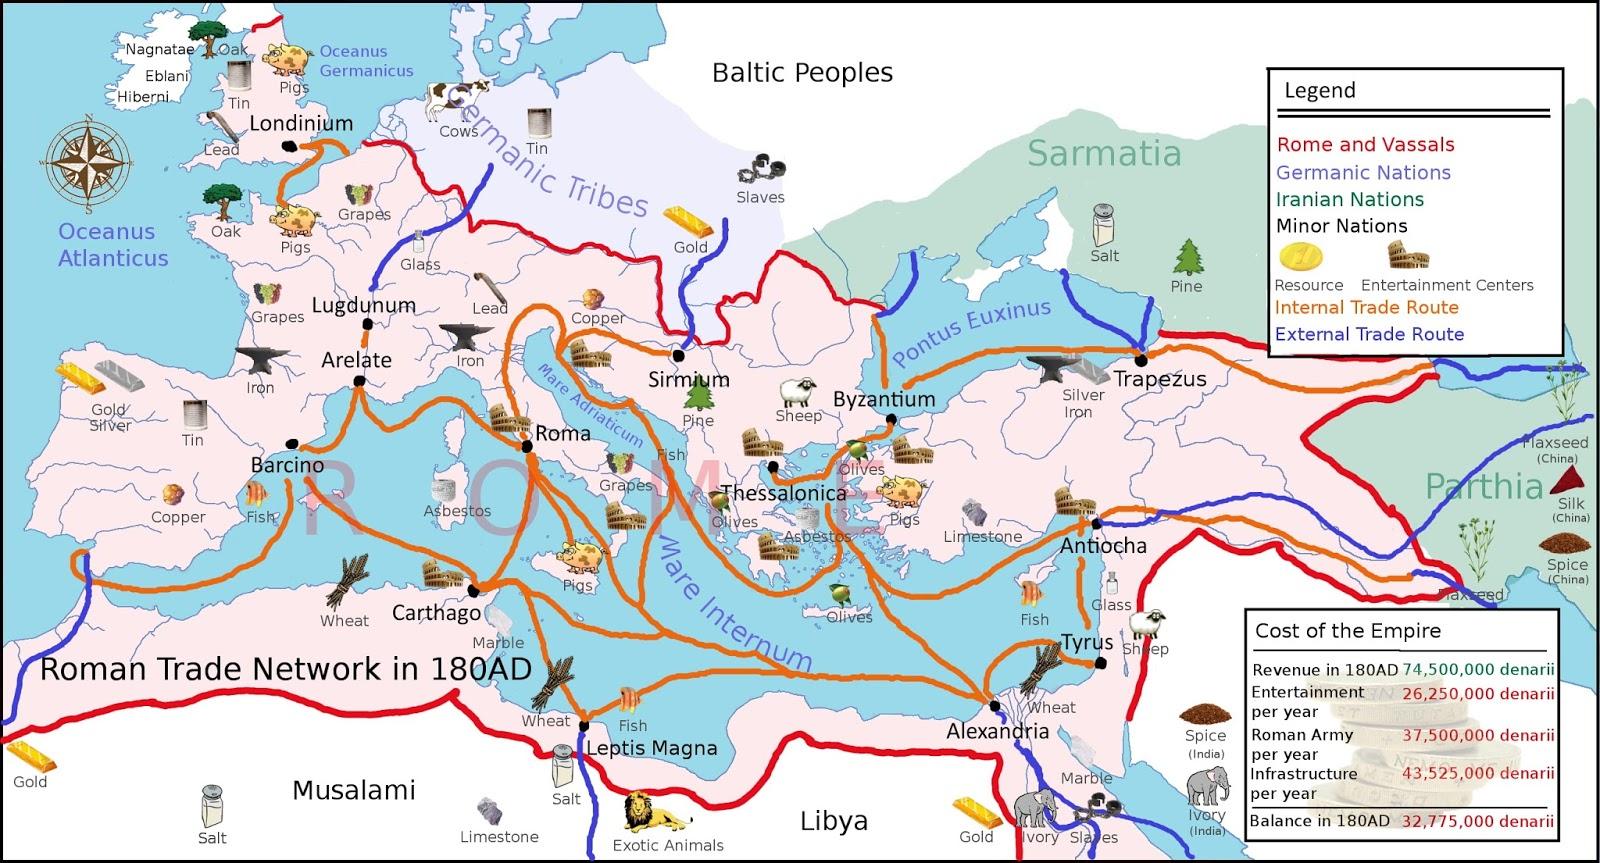 Trade Routes of the Roman Empire in 180 AD